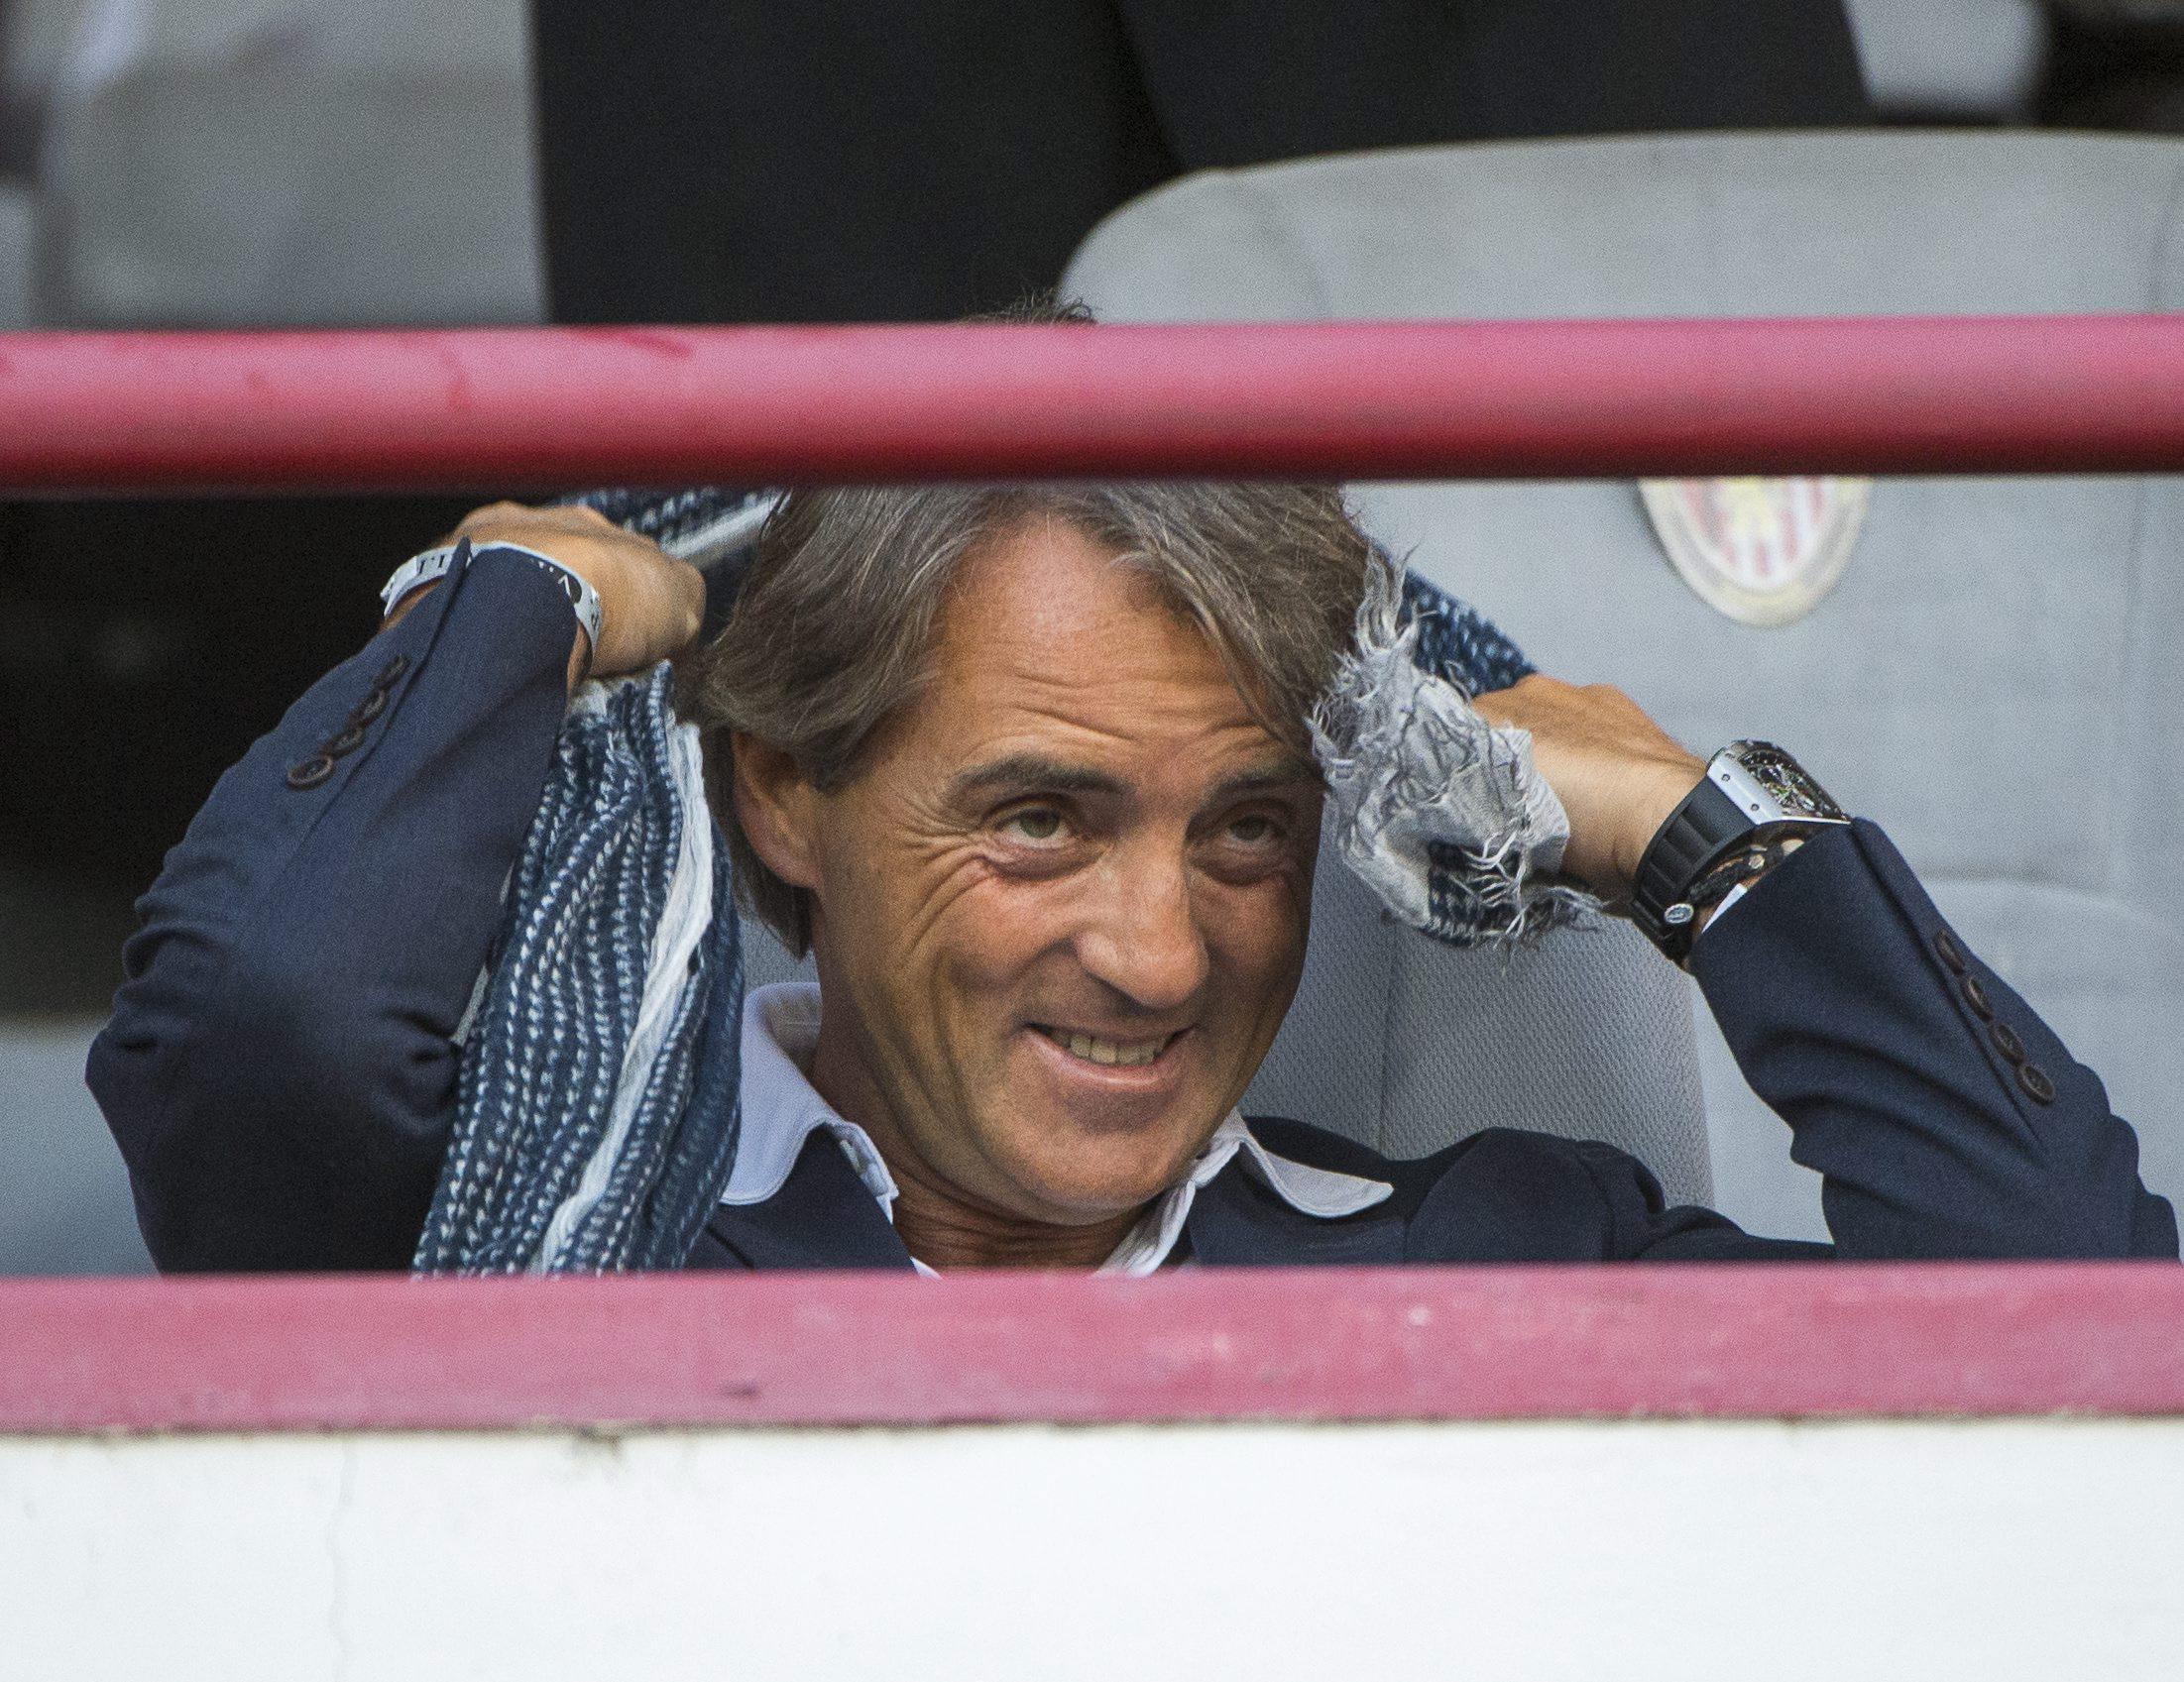 Roberto Mancini 2013-ban a kispesti Bozsik-stadionban